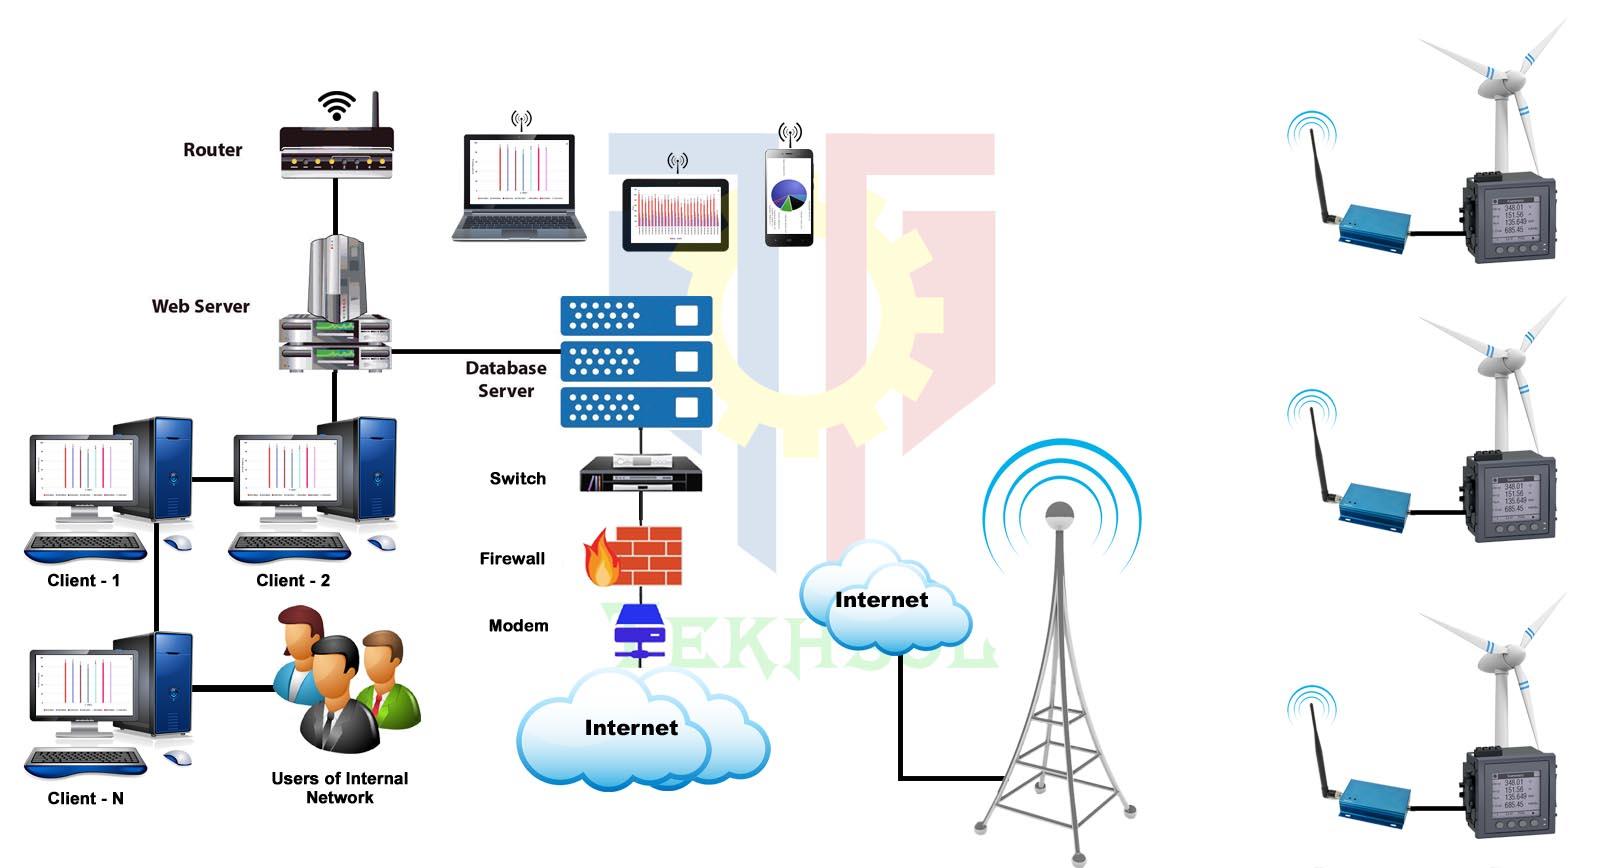 Tekhsol Wind Turbine Diagrams Block Diagram For Web Based Monitoring System